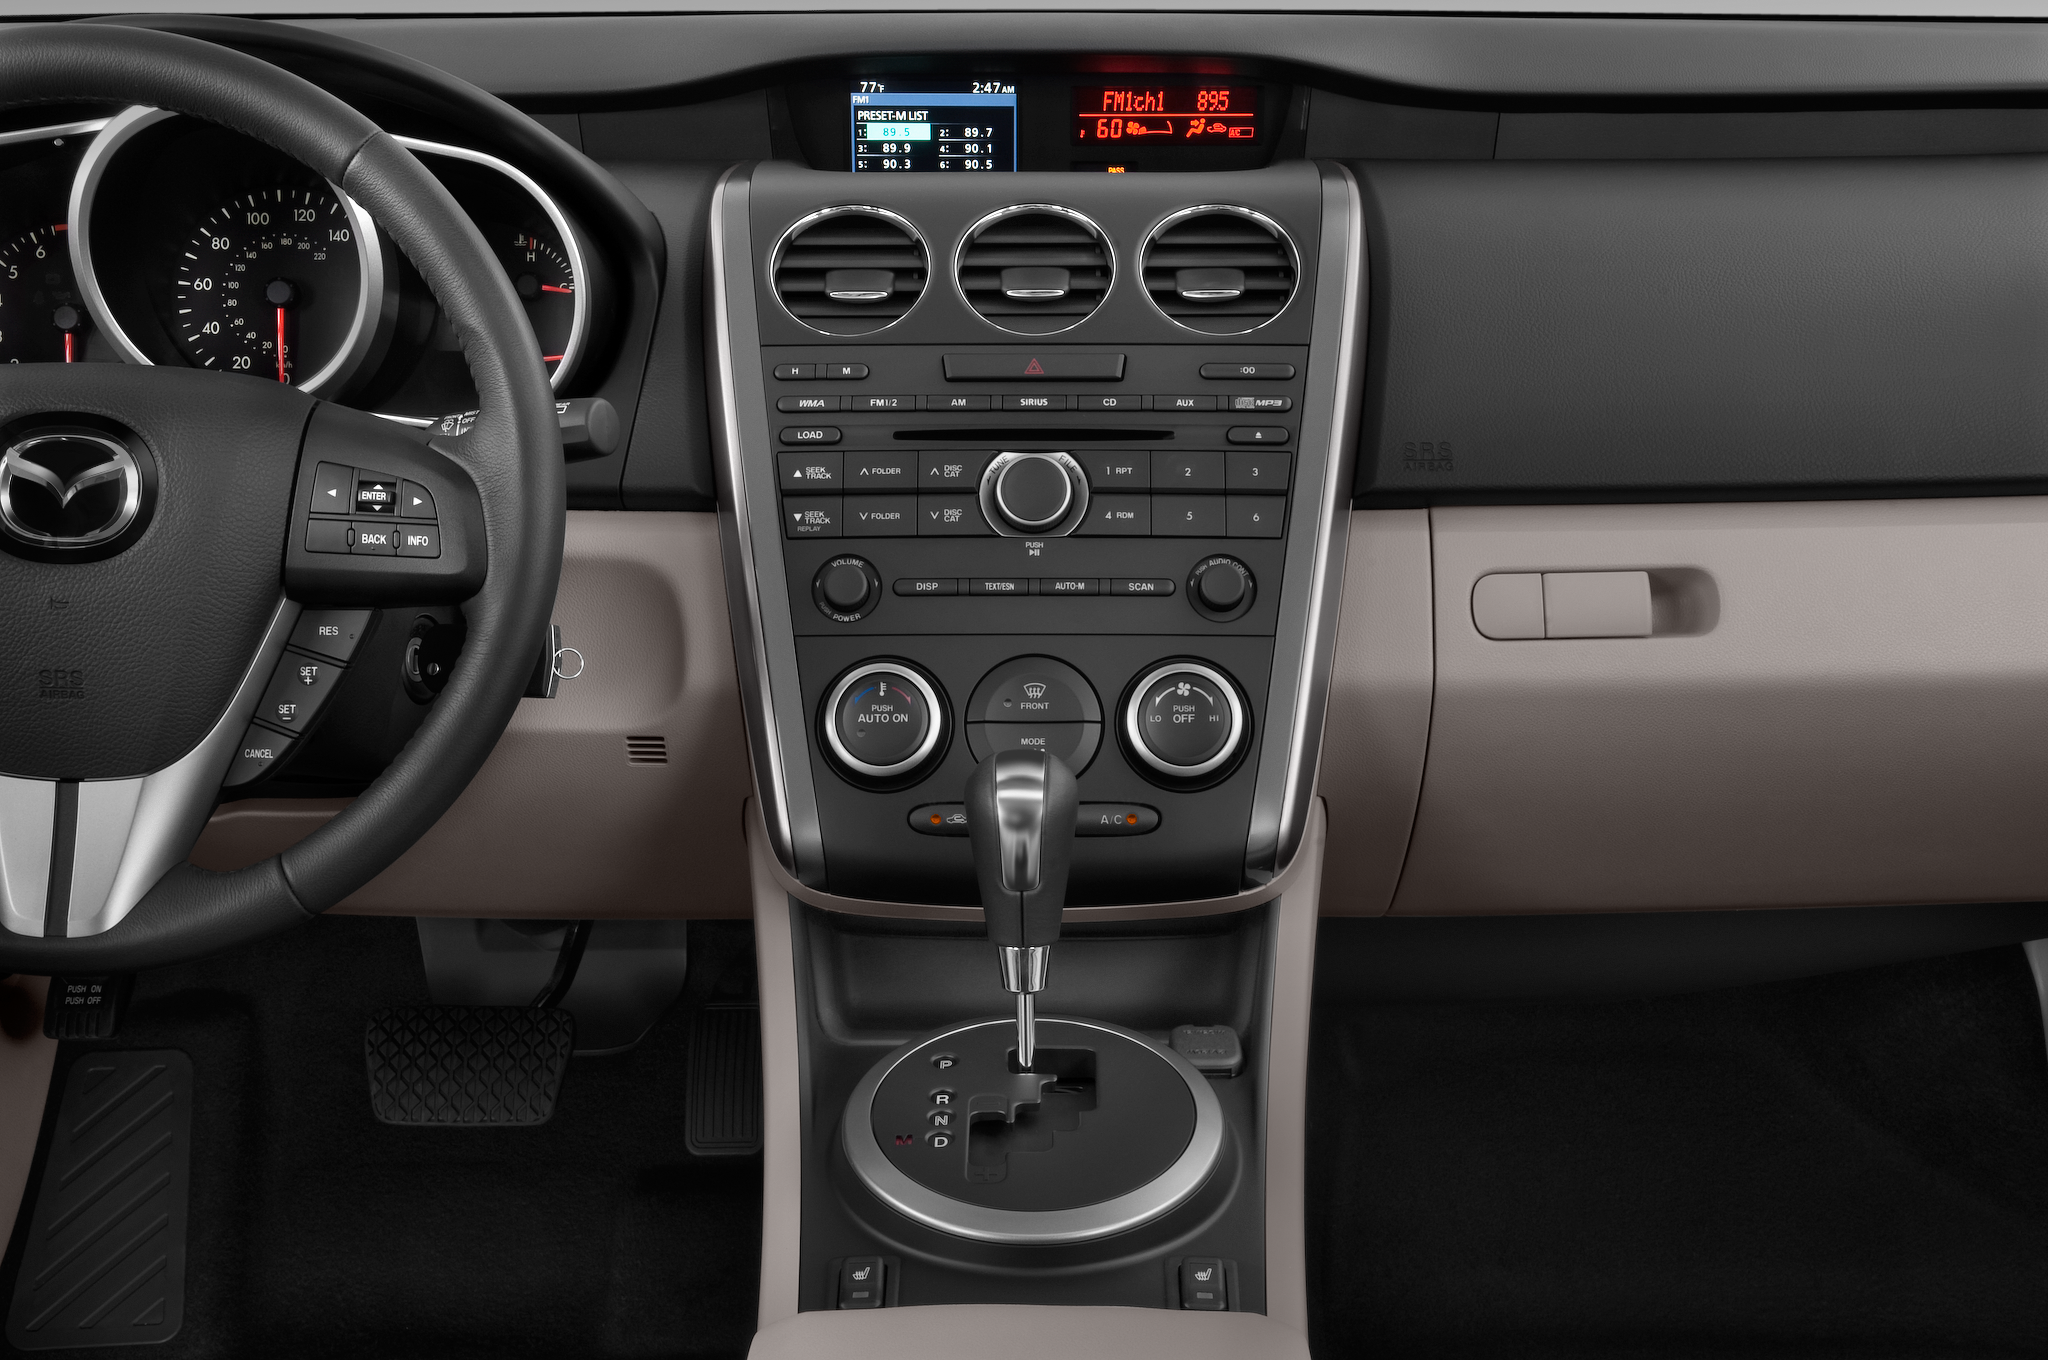 http://st.automobilemag.com/uploads/sites/10/2015/11/2010-mazda-cx7-i-sport-suv-instrument-panel.png